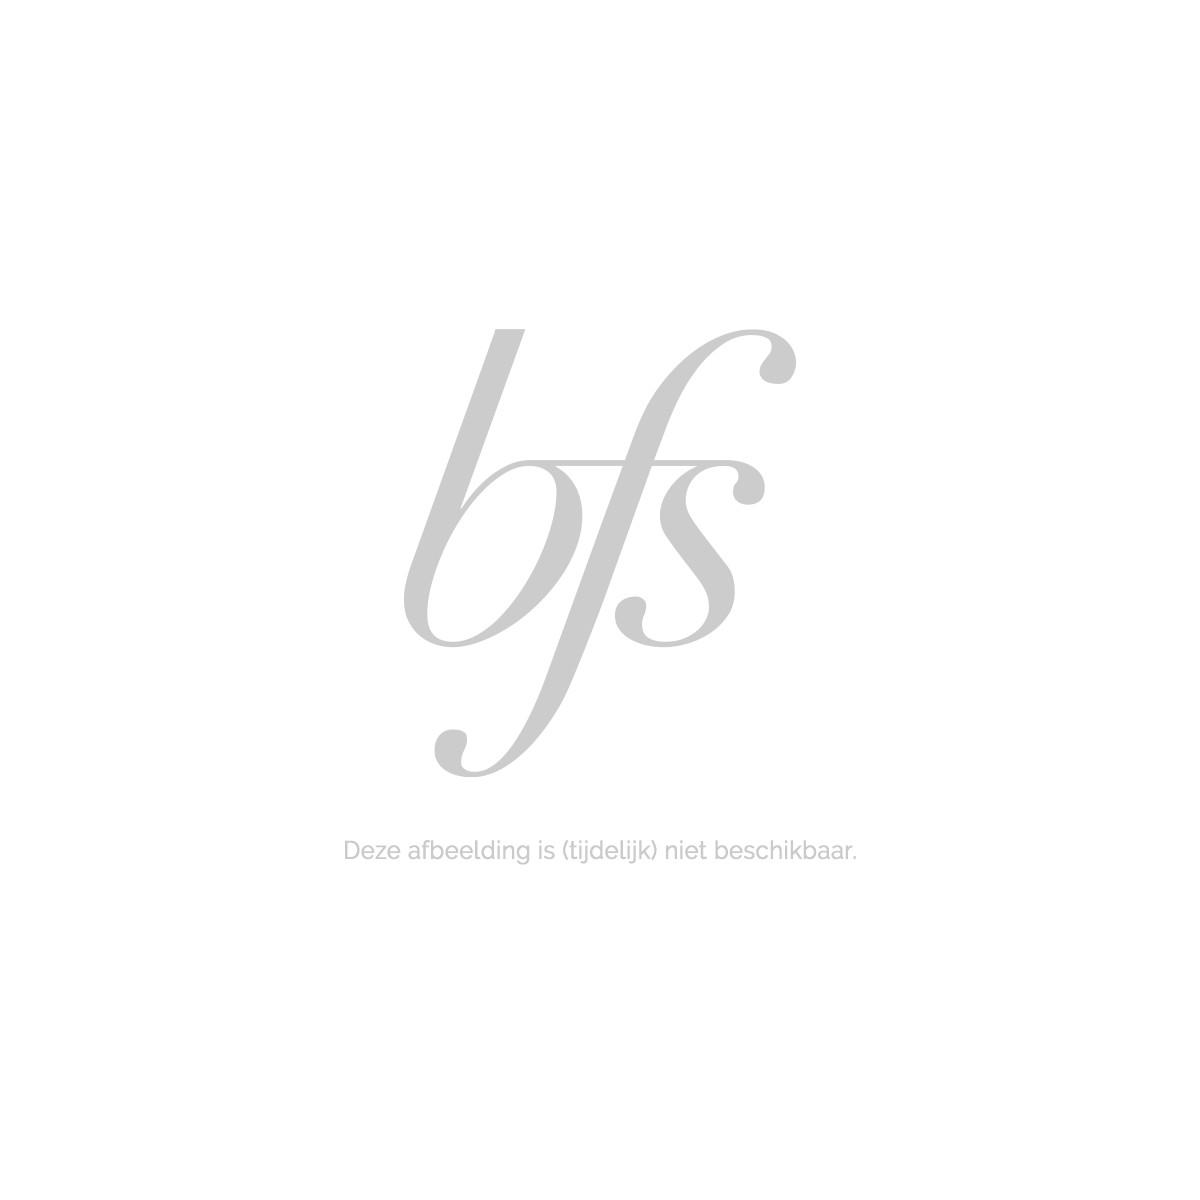 Pupa Smoothing Foundation Primer